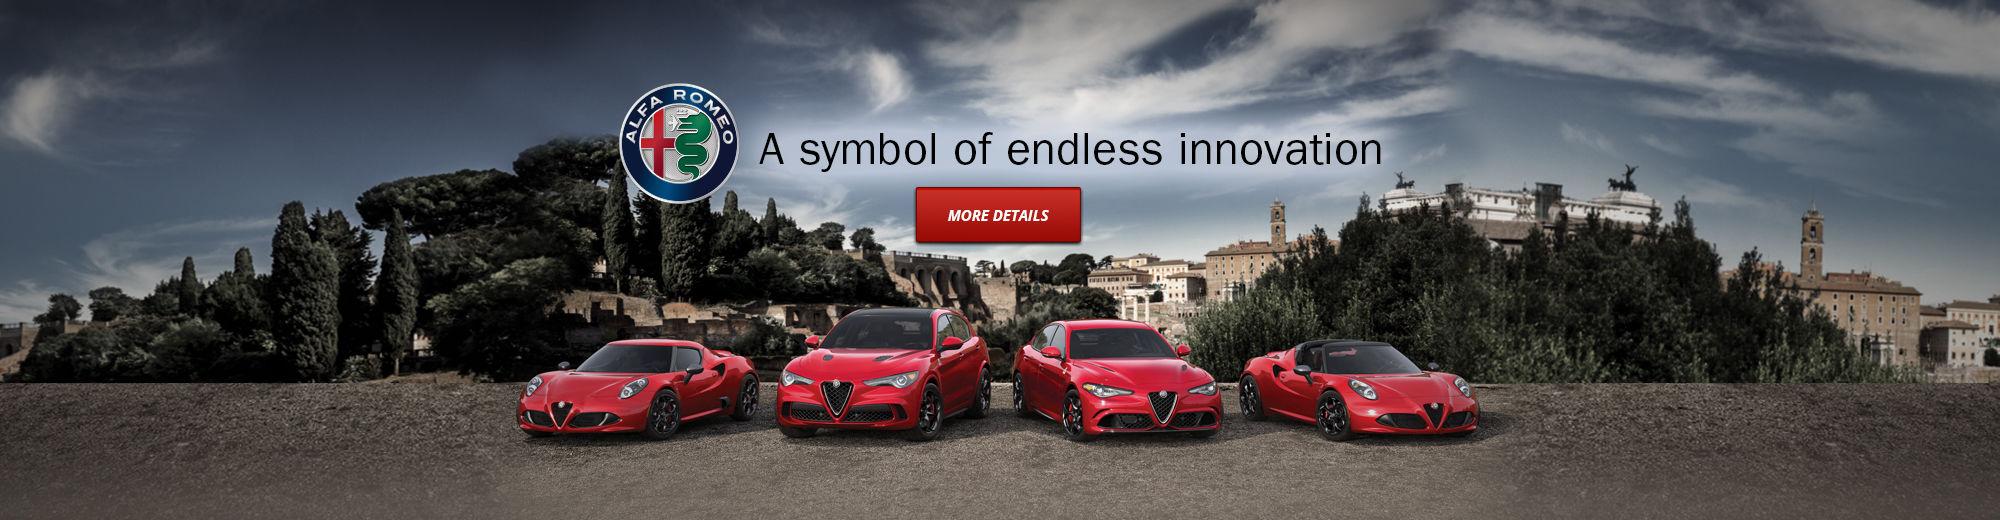 Alfa Romeo A symbol of endless innovation